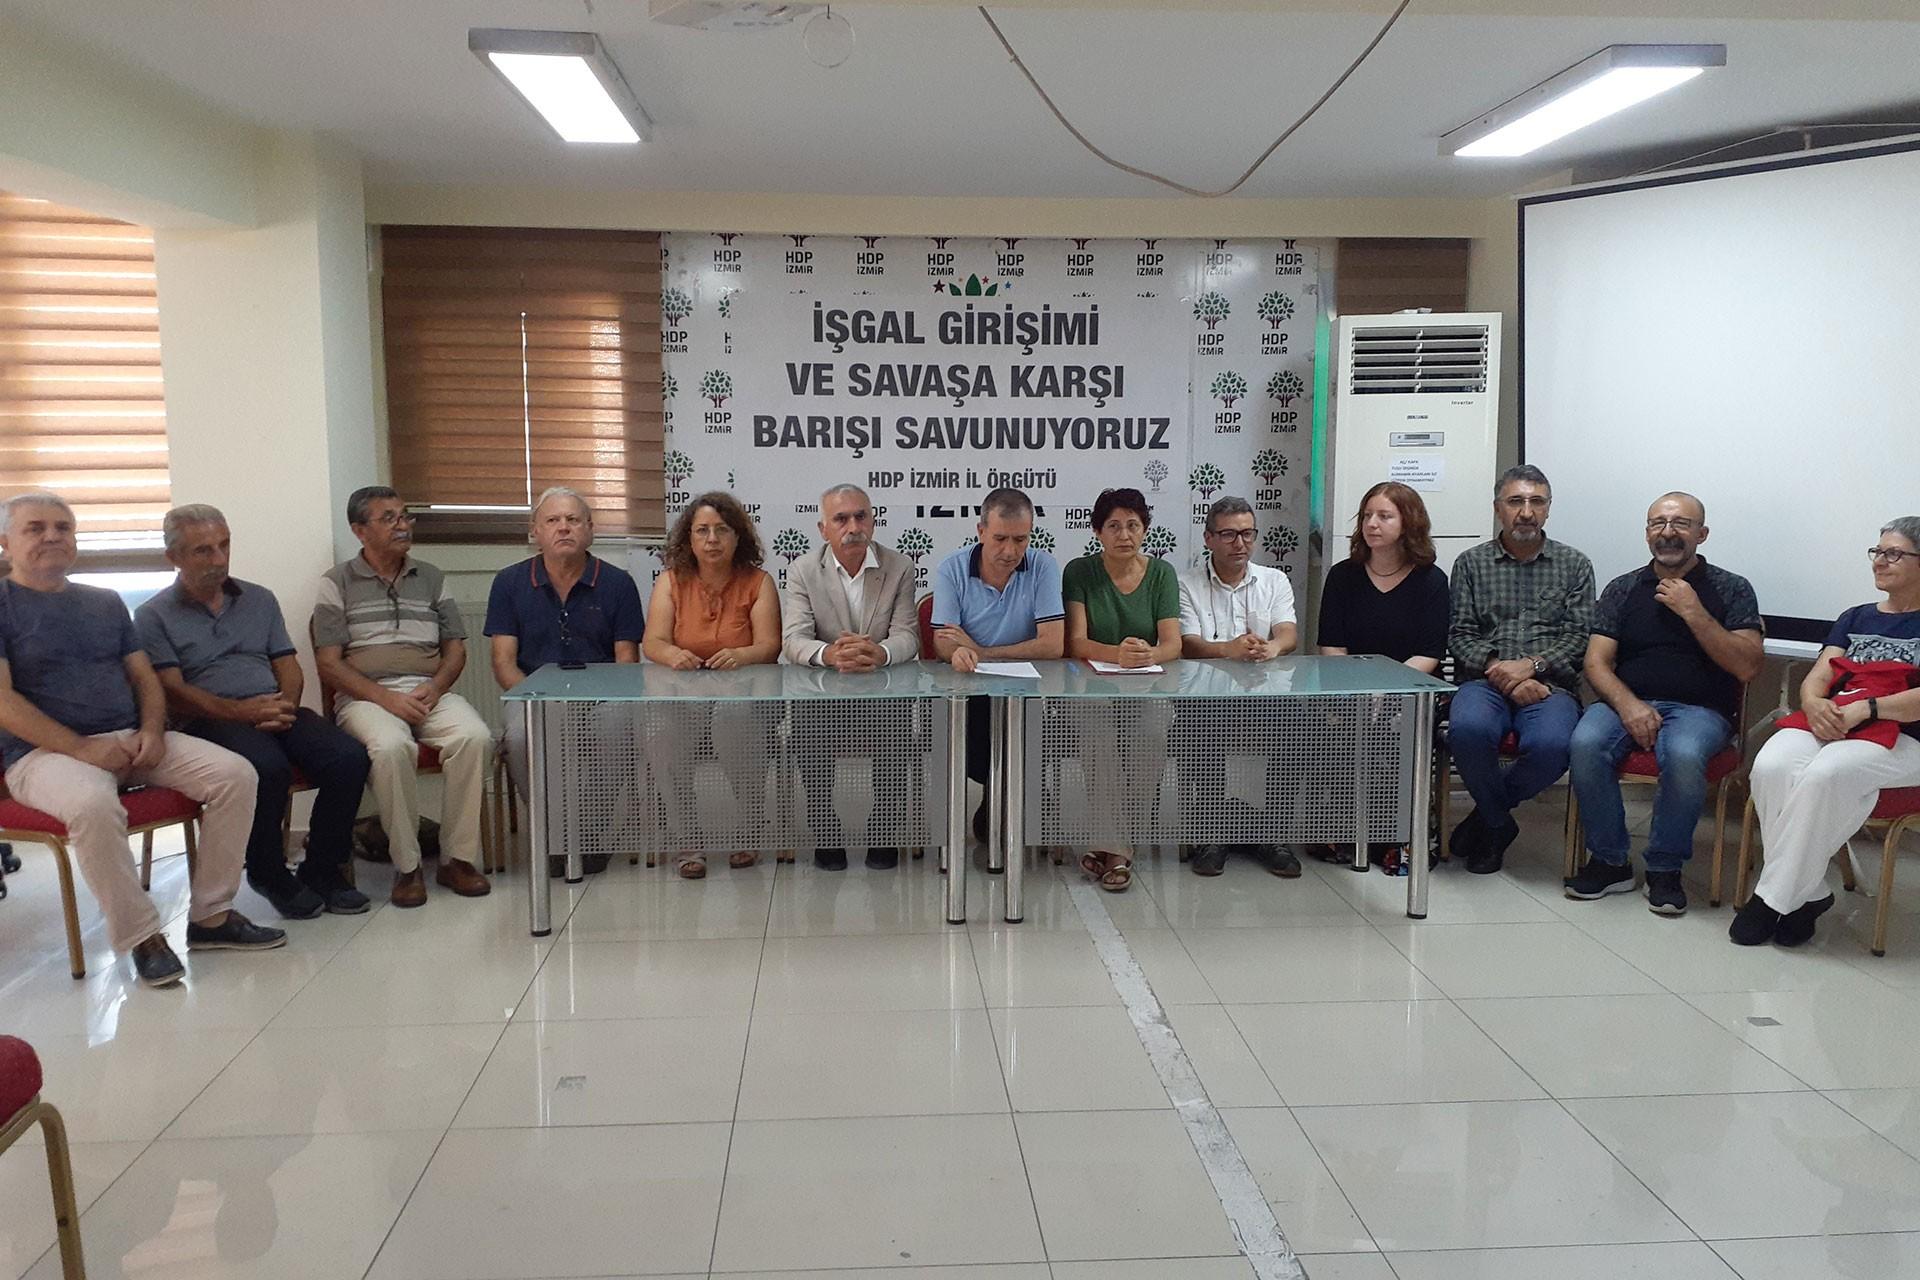 HDP İzmir İl Örgütü: İşgal ve savaşa karşı barışı savunuyoruz